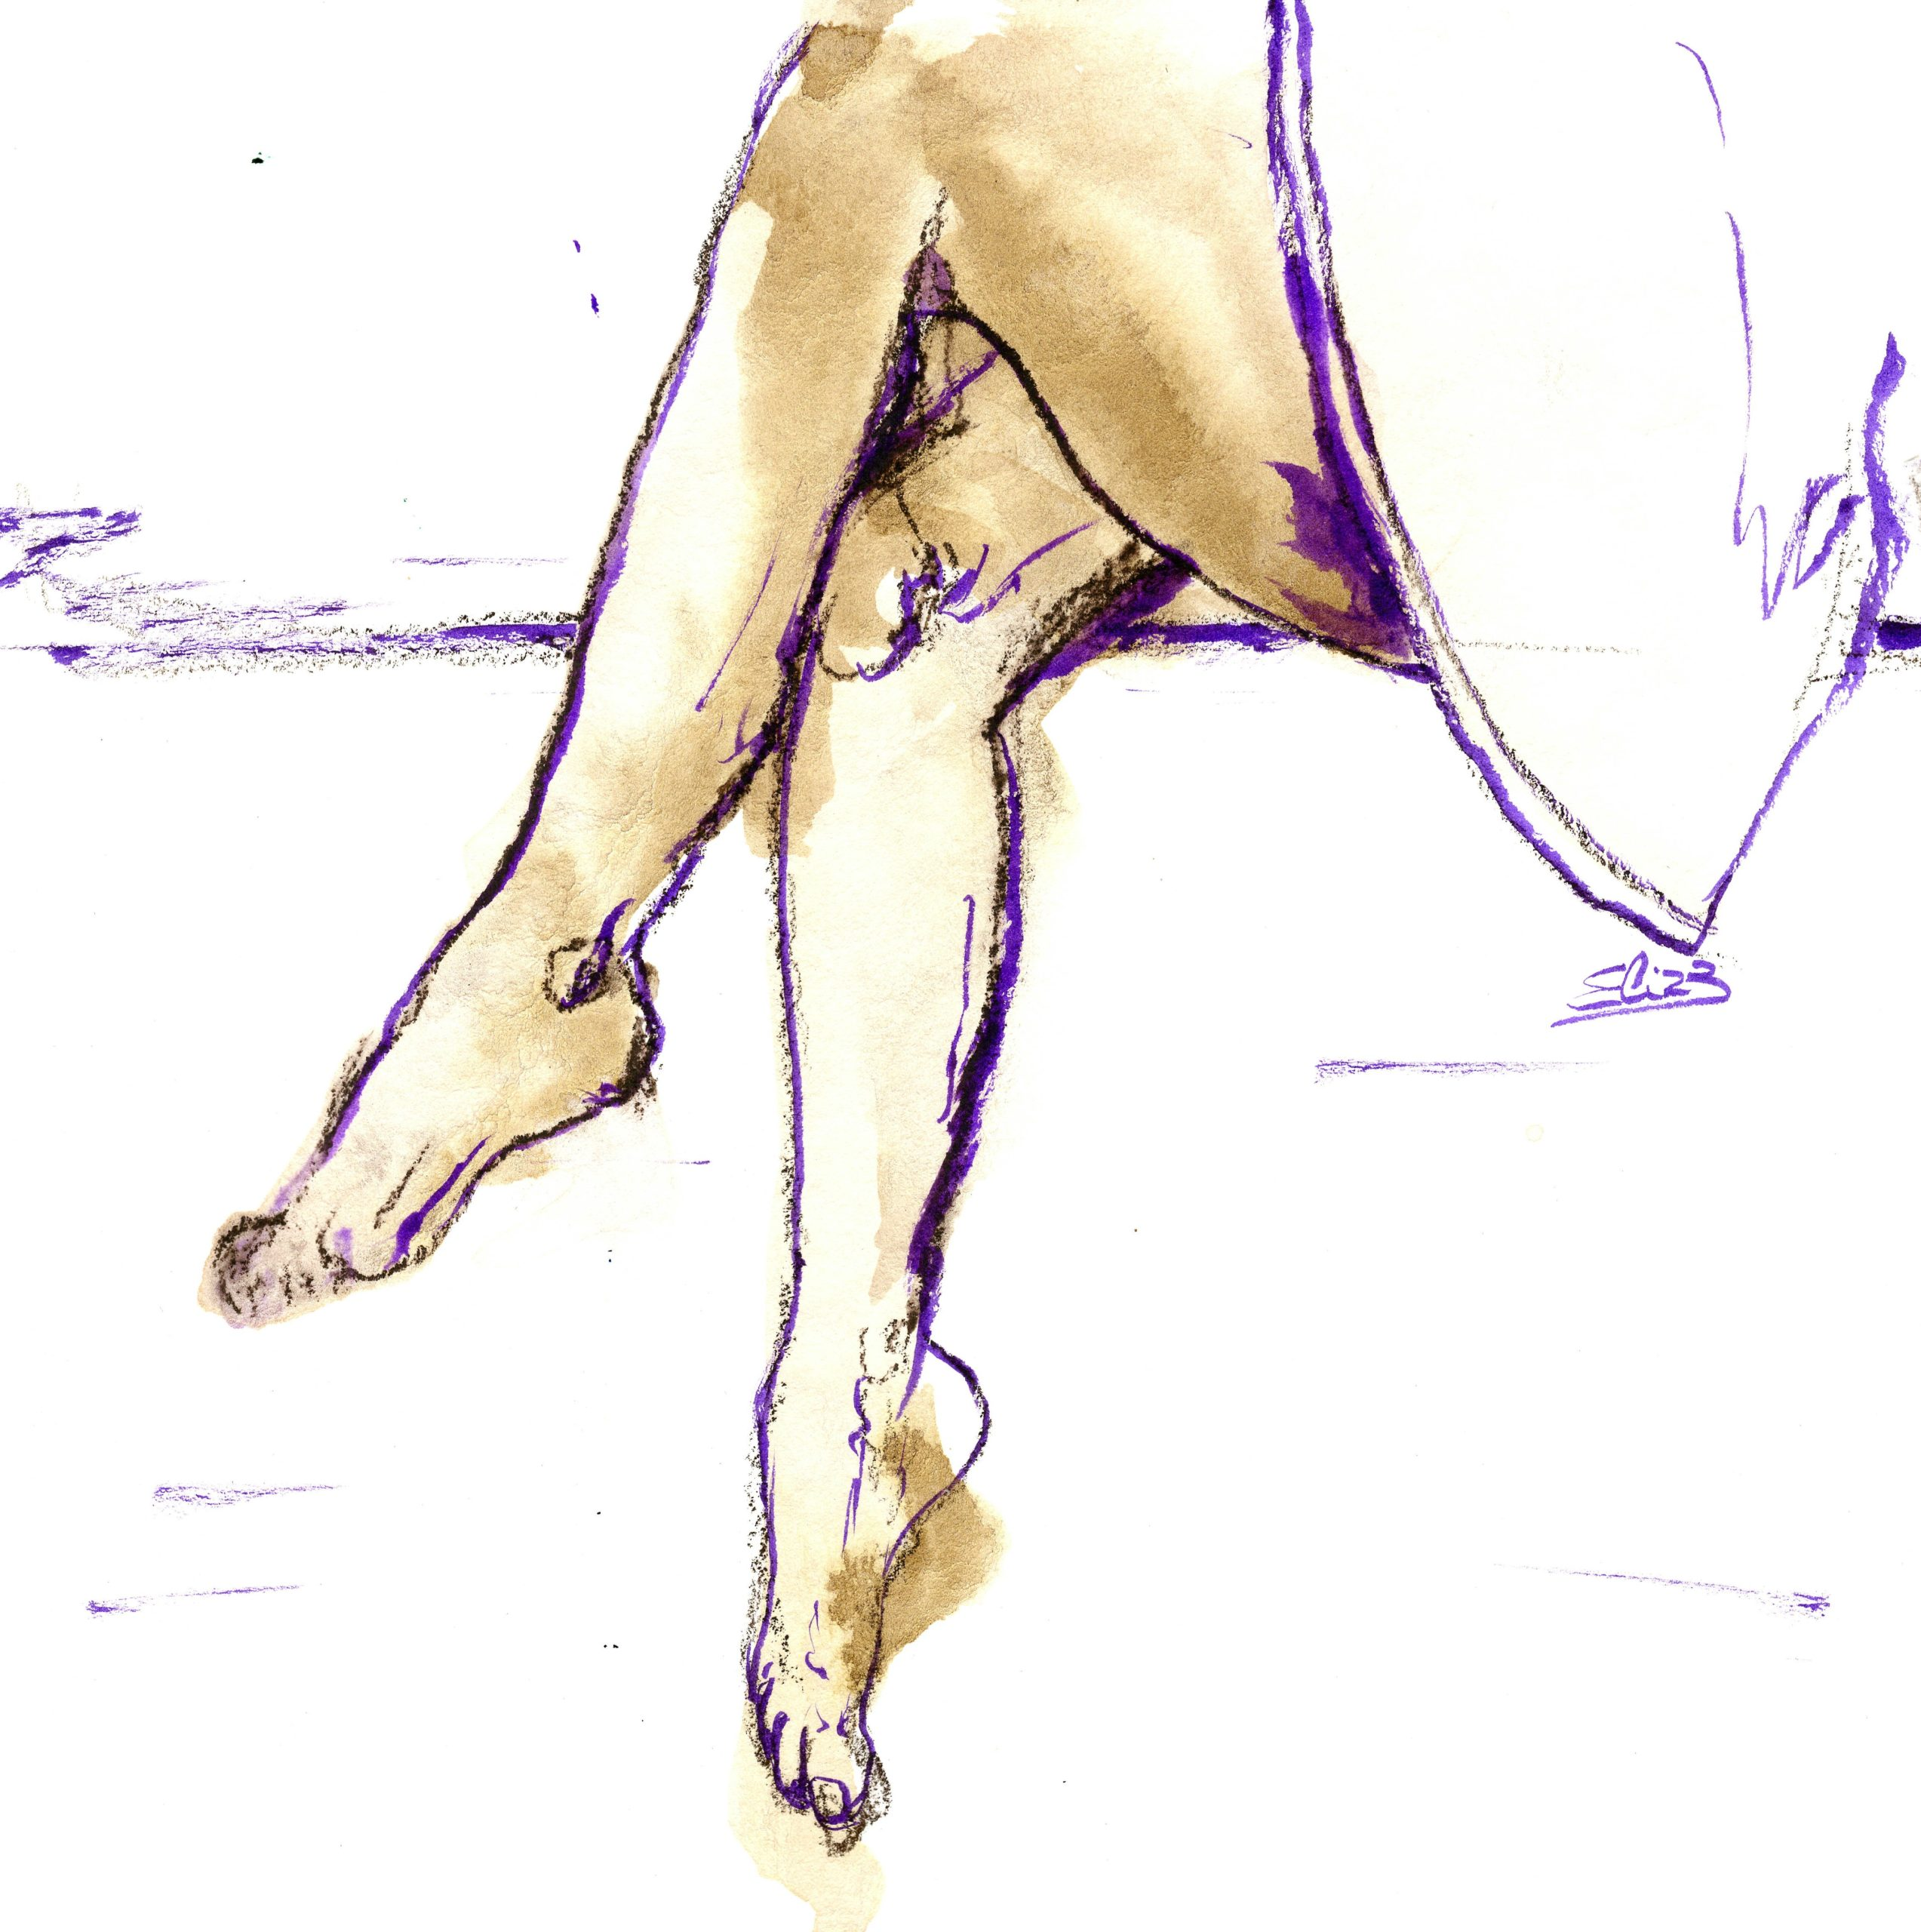 esquisse jeu de jambes jupe Elize pigmentropie